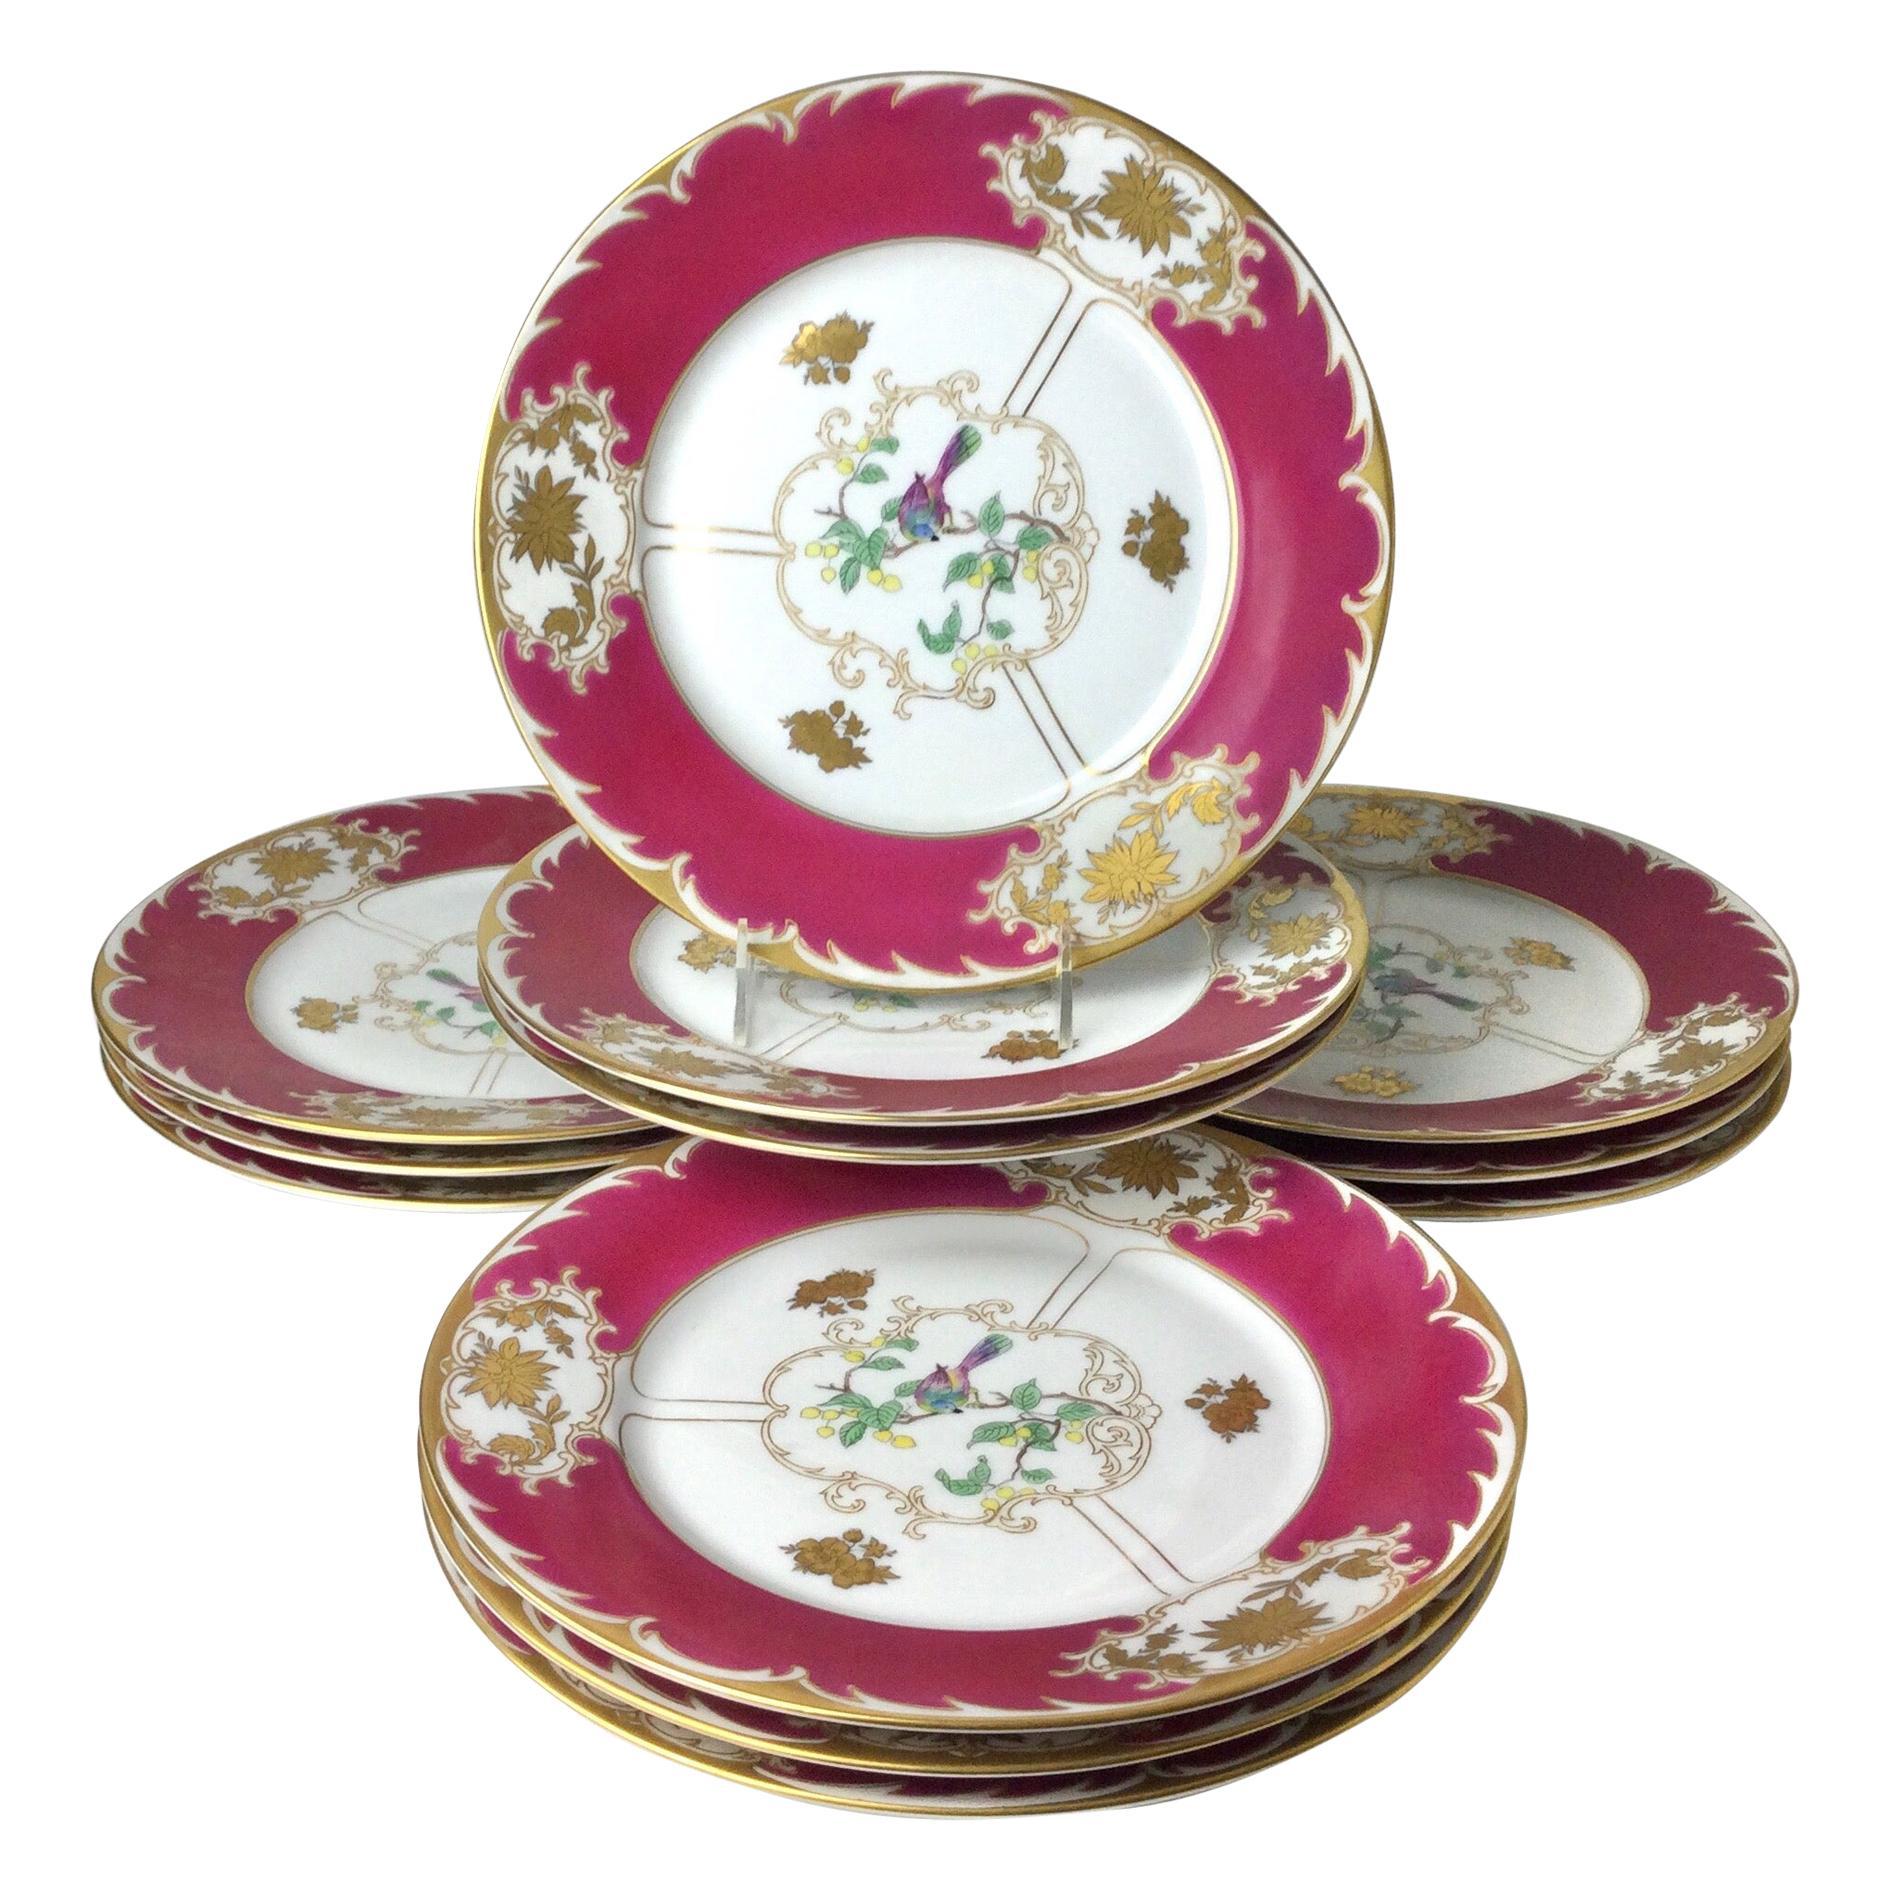 Set of 12 Royal Bayreuth Service Dinner Plates